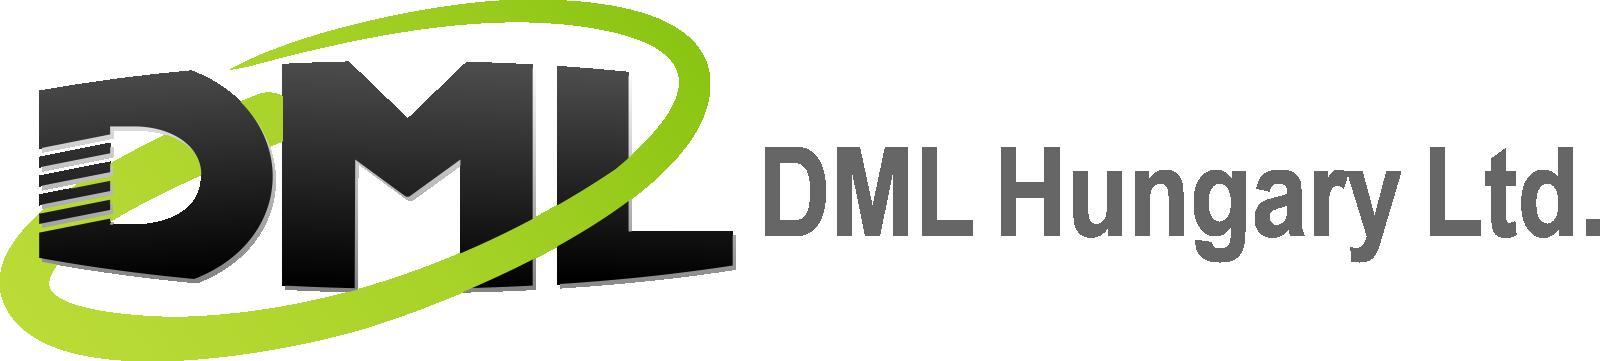 DML Hungary Ltd. induction lighting